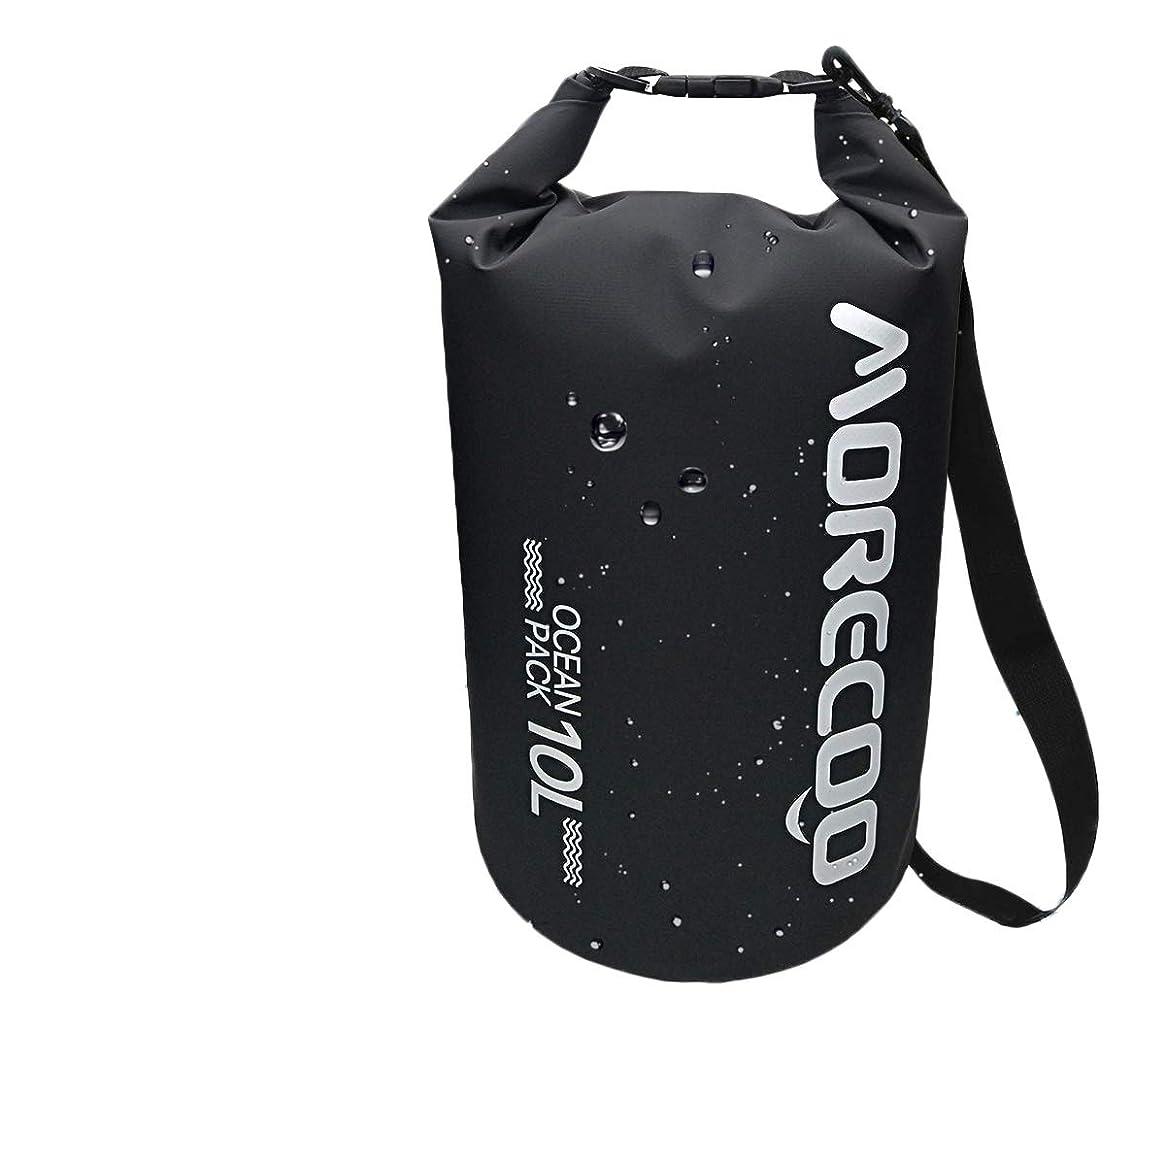 MORECOO-Floating Waterproof Dry Bag- Waterproof Dry Bag Roll Top Sack Keeps Gear Dry 5L/10L/ for Kayaking/Rafting/Boating/Swimming/Camping/Hiking/Beach/Fishing